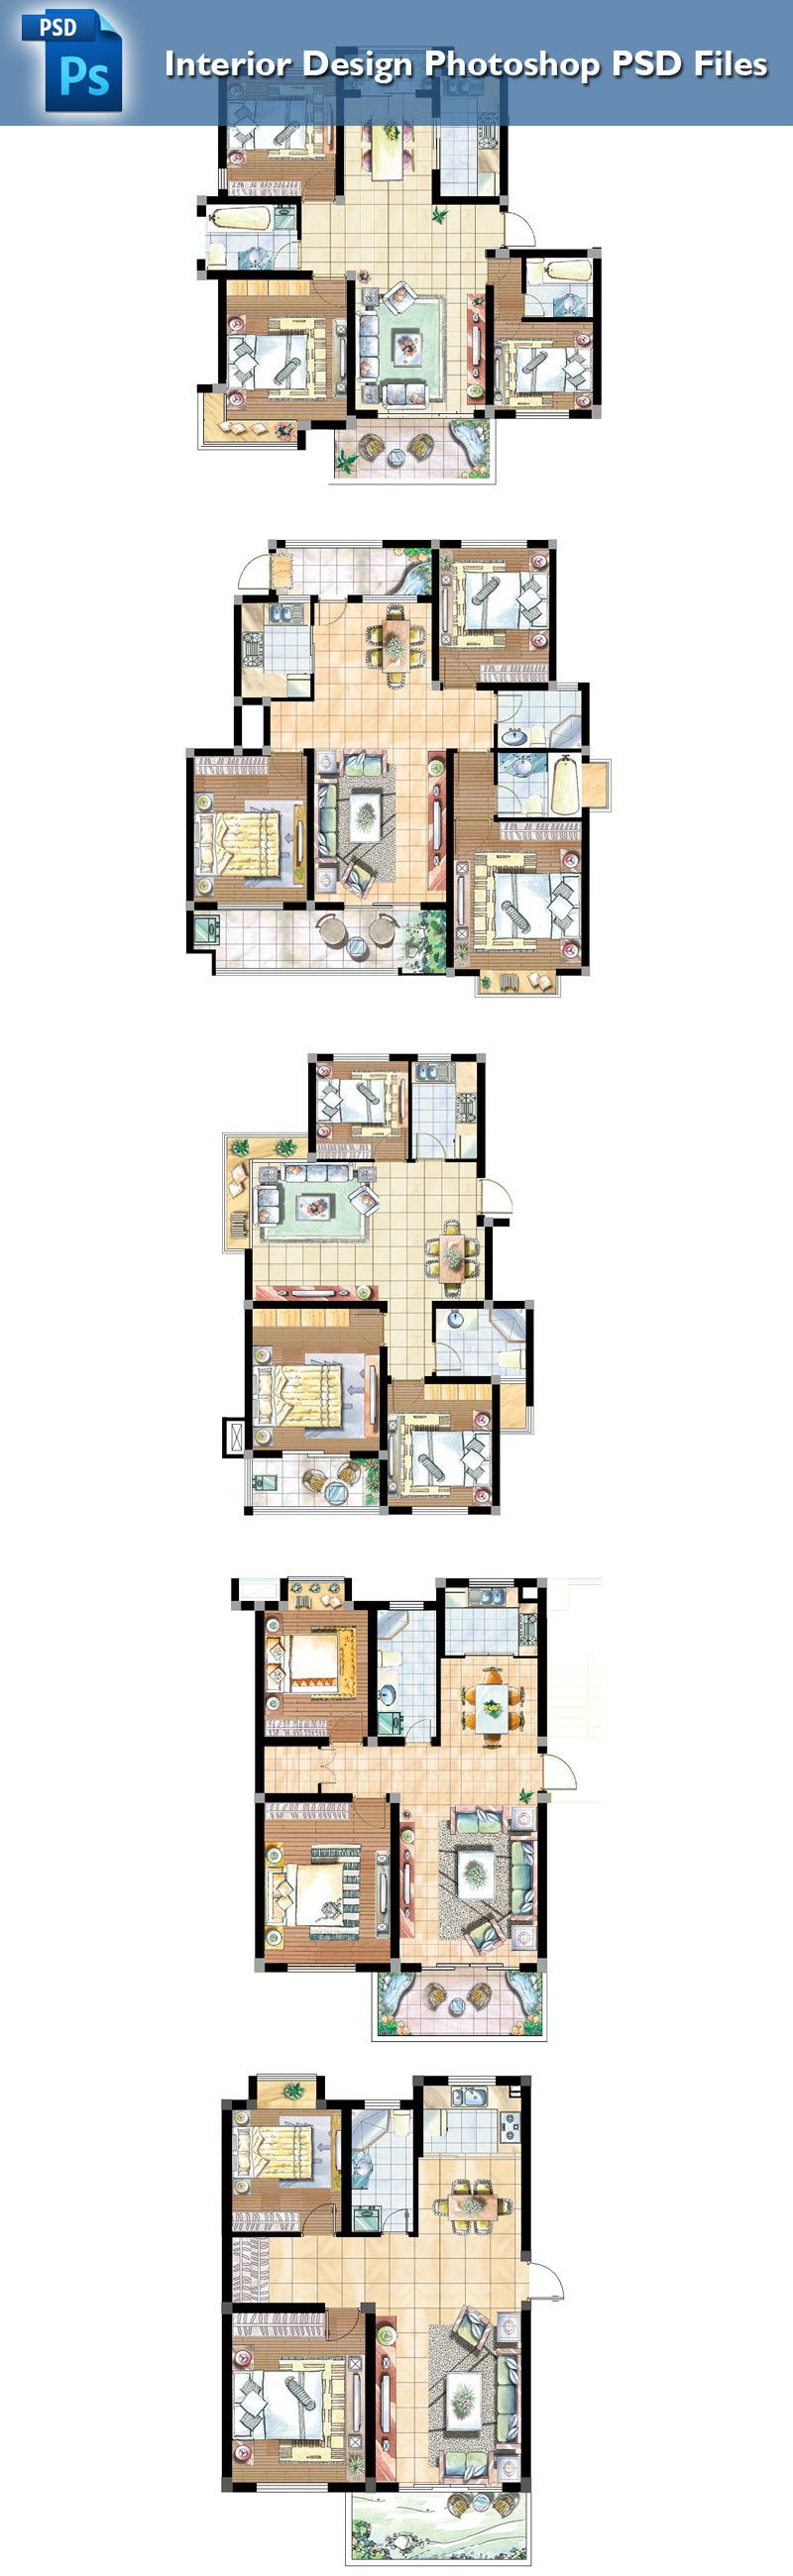 Interior Design Drawing Templates Part - 20: 15 Types Of Interior Design Layouts Photoshop PSD Template V.1